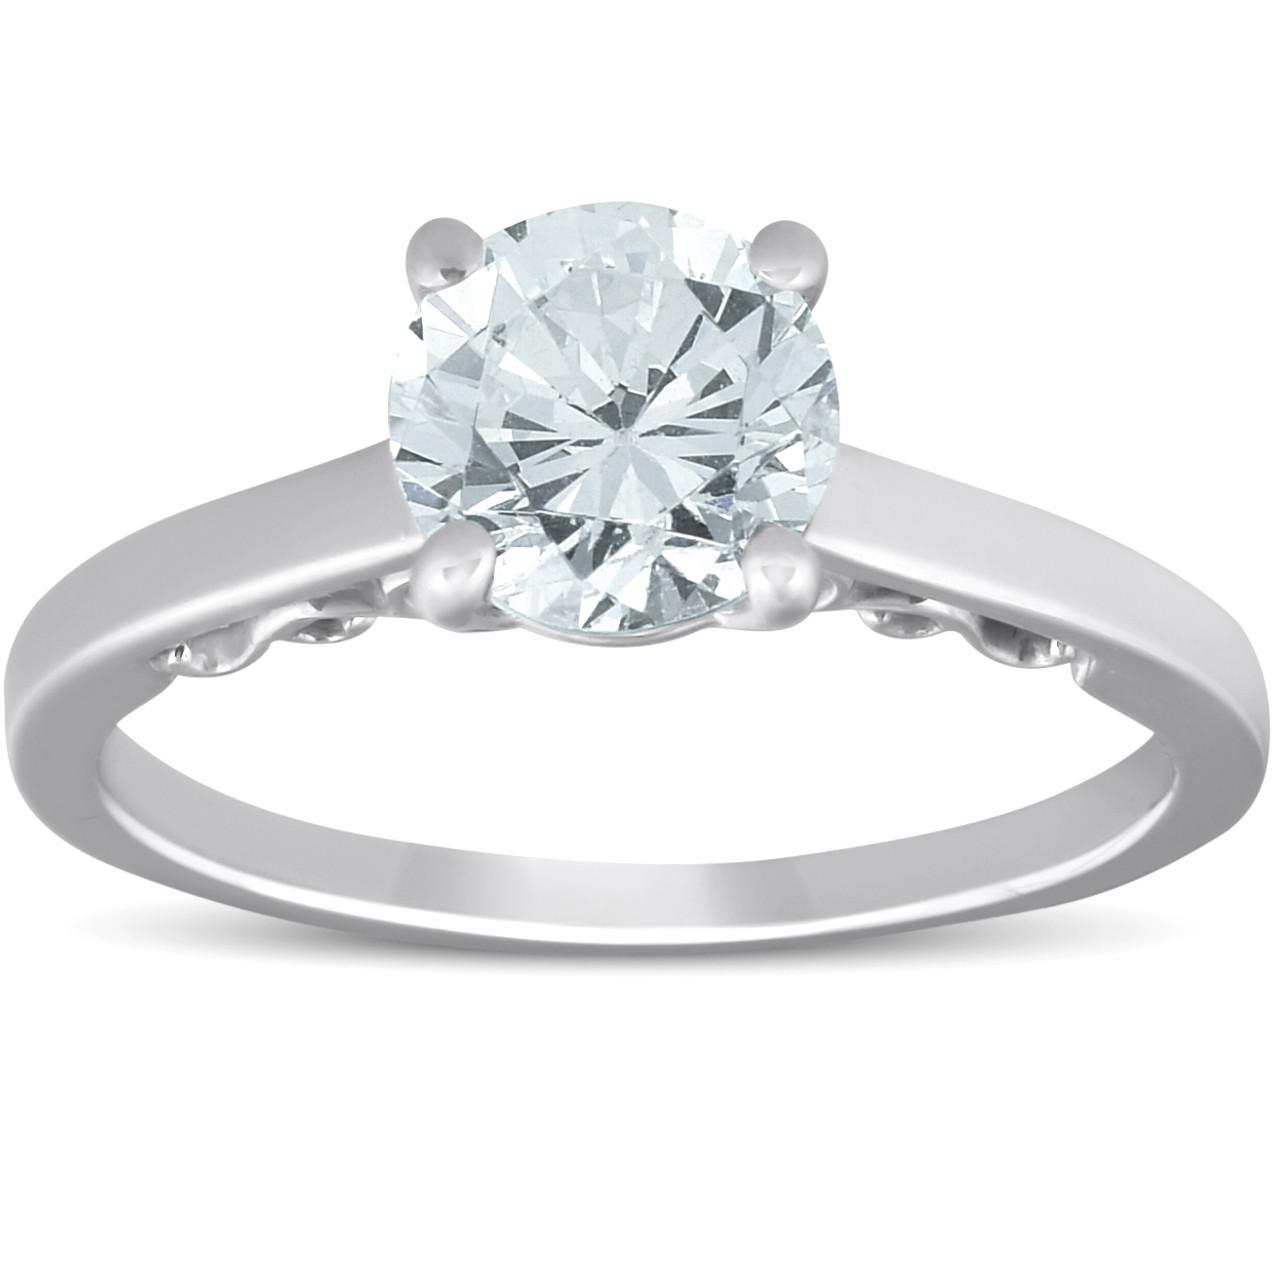 Engagement Rings Vs Wedding Bands: 1.52 Ct Diamond & CZ Center Engagement Solitaire Vintage